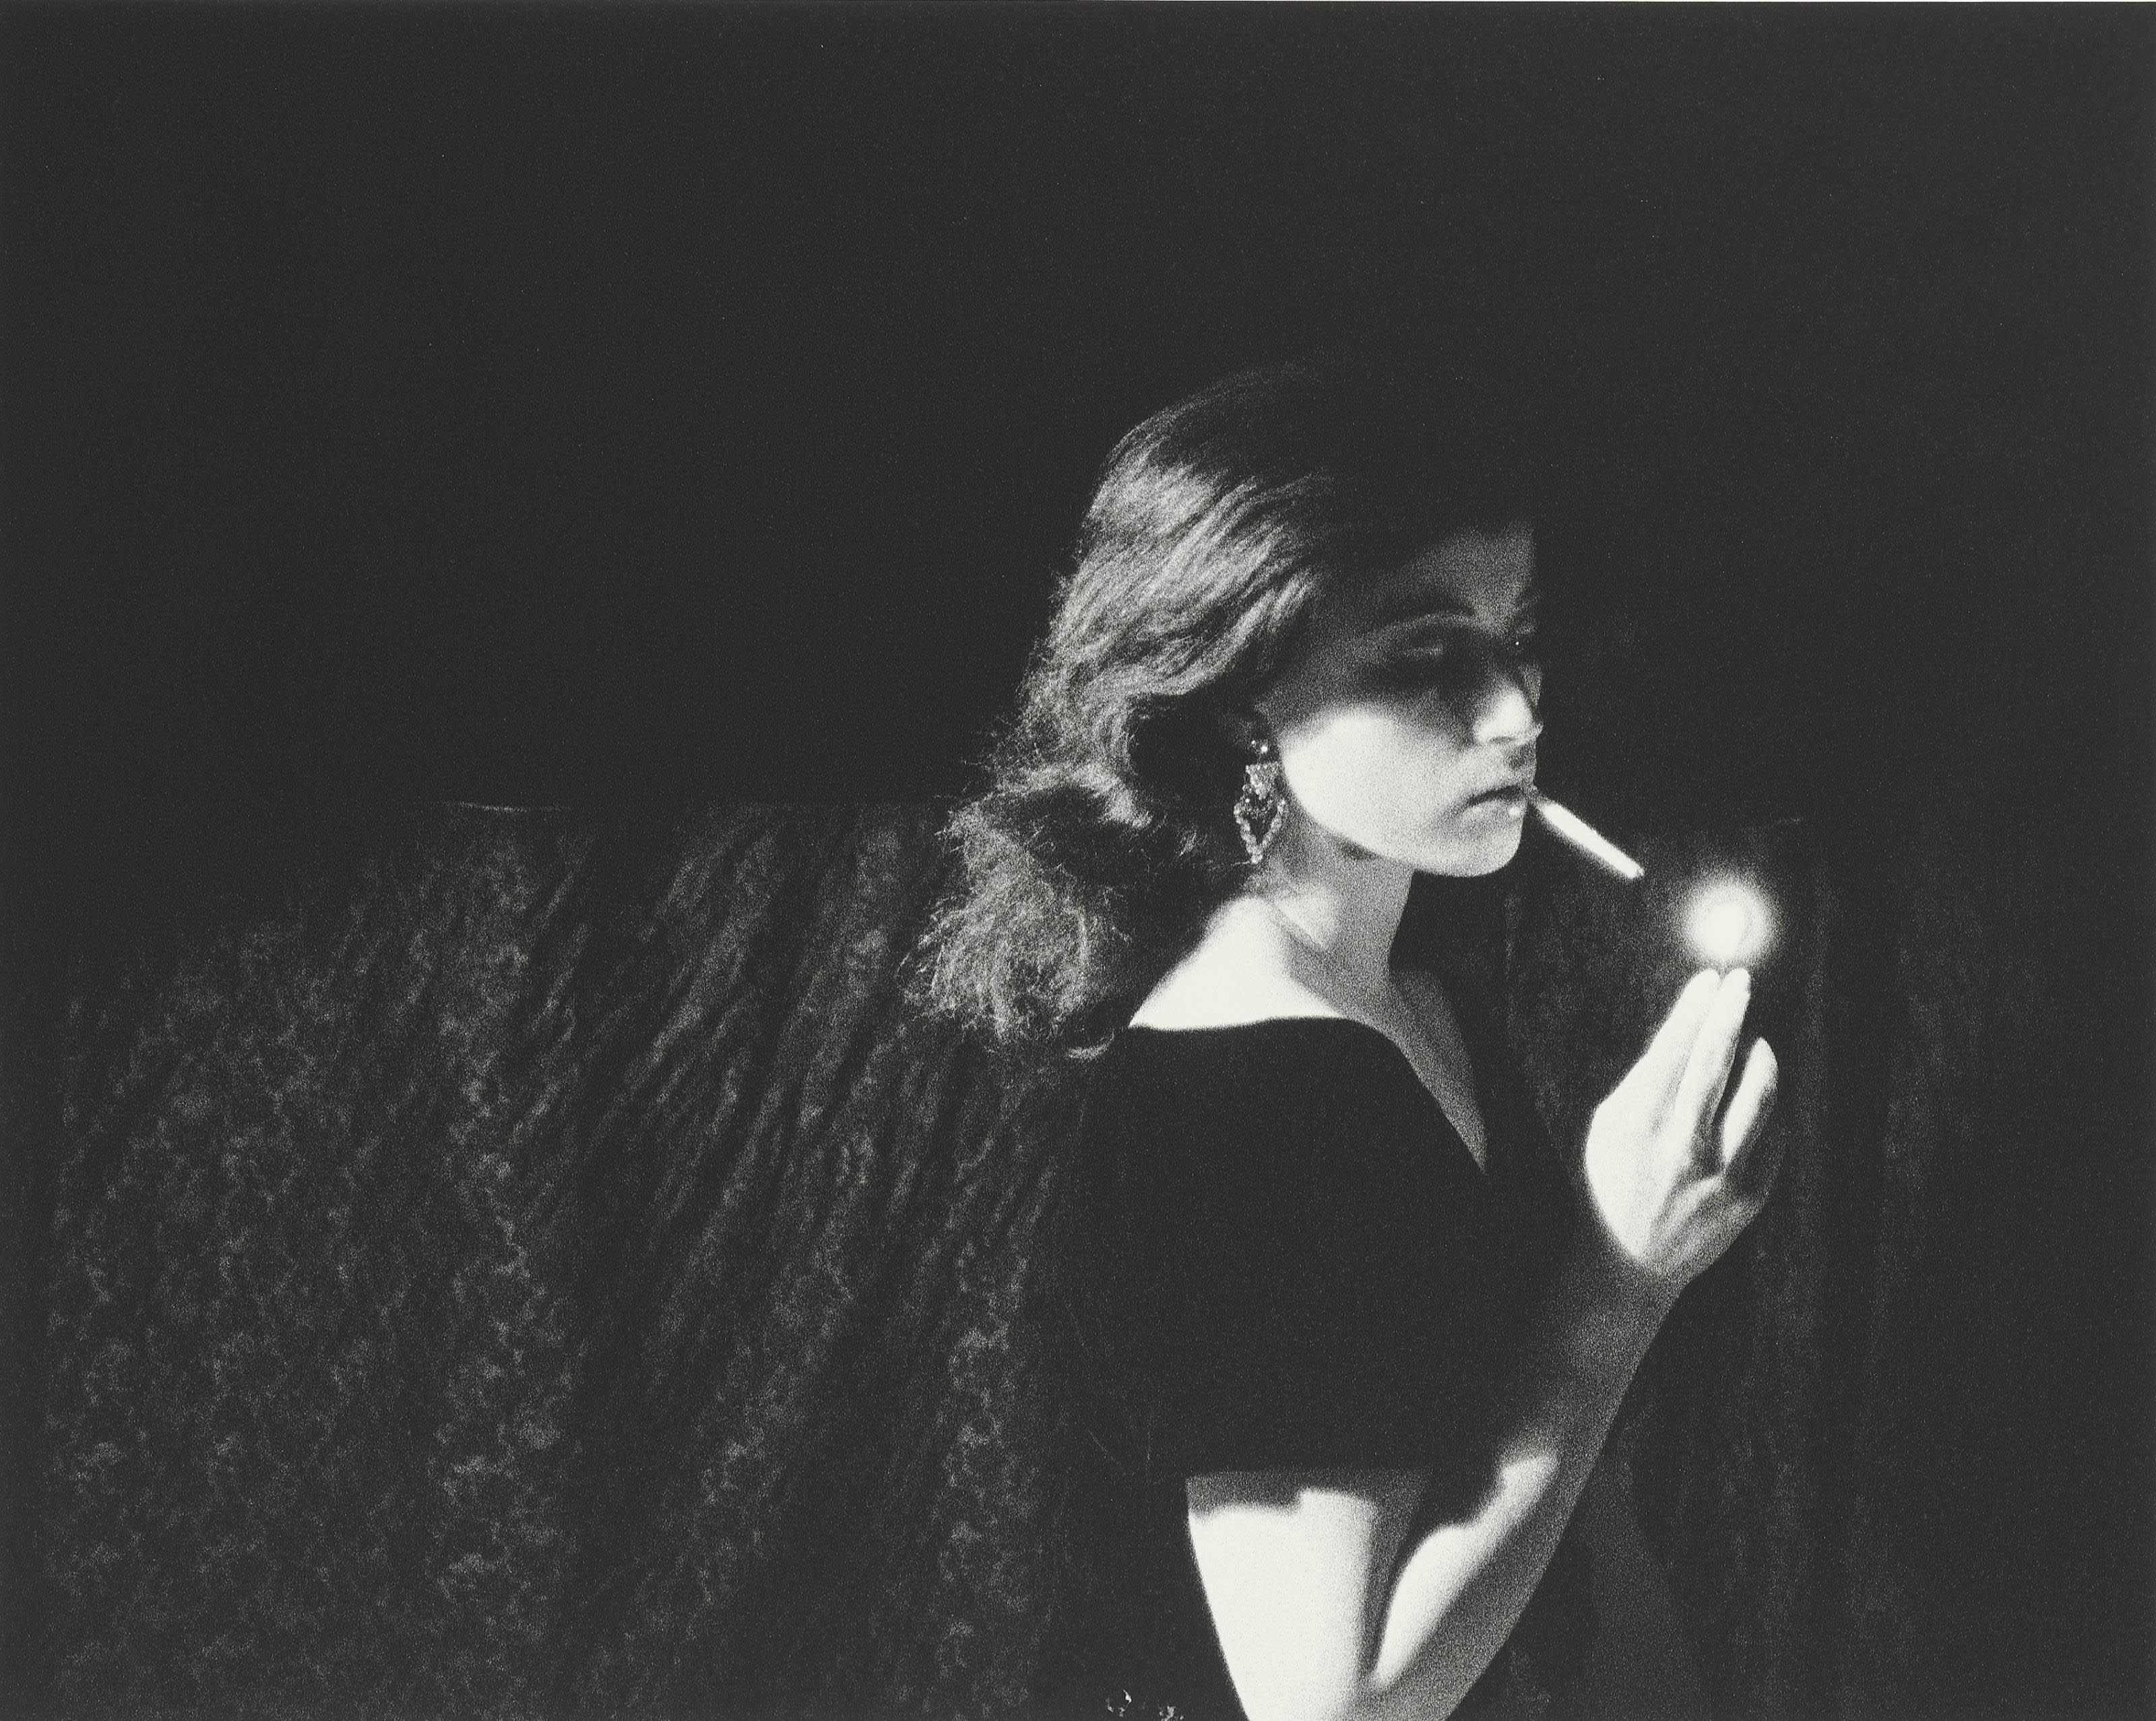 Untitled Film Still #20, 1979 - Cindy Sherman - WikiArt.org